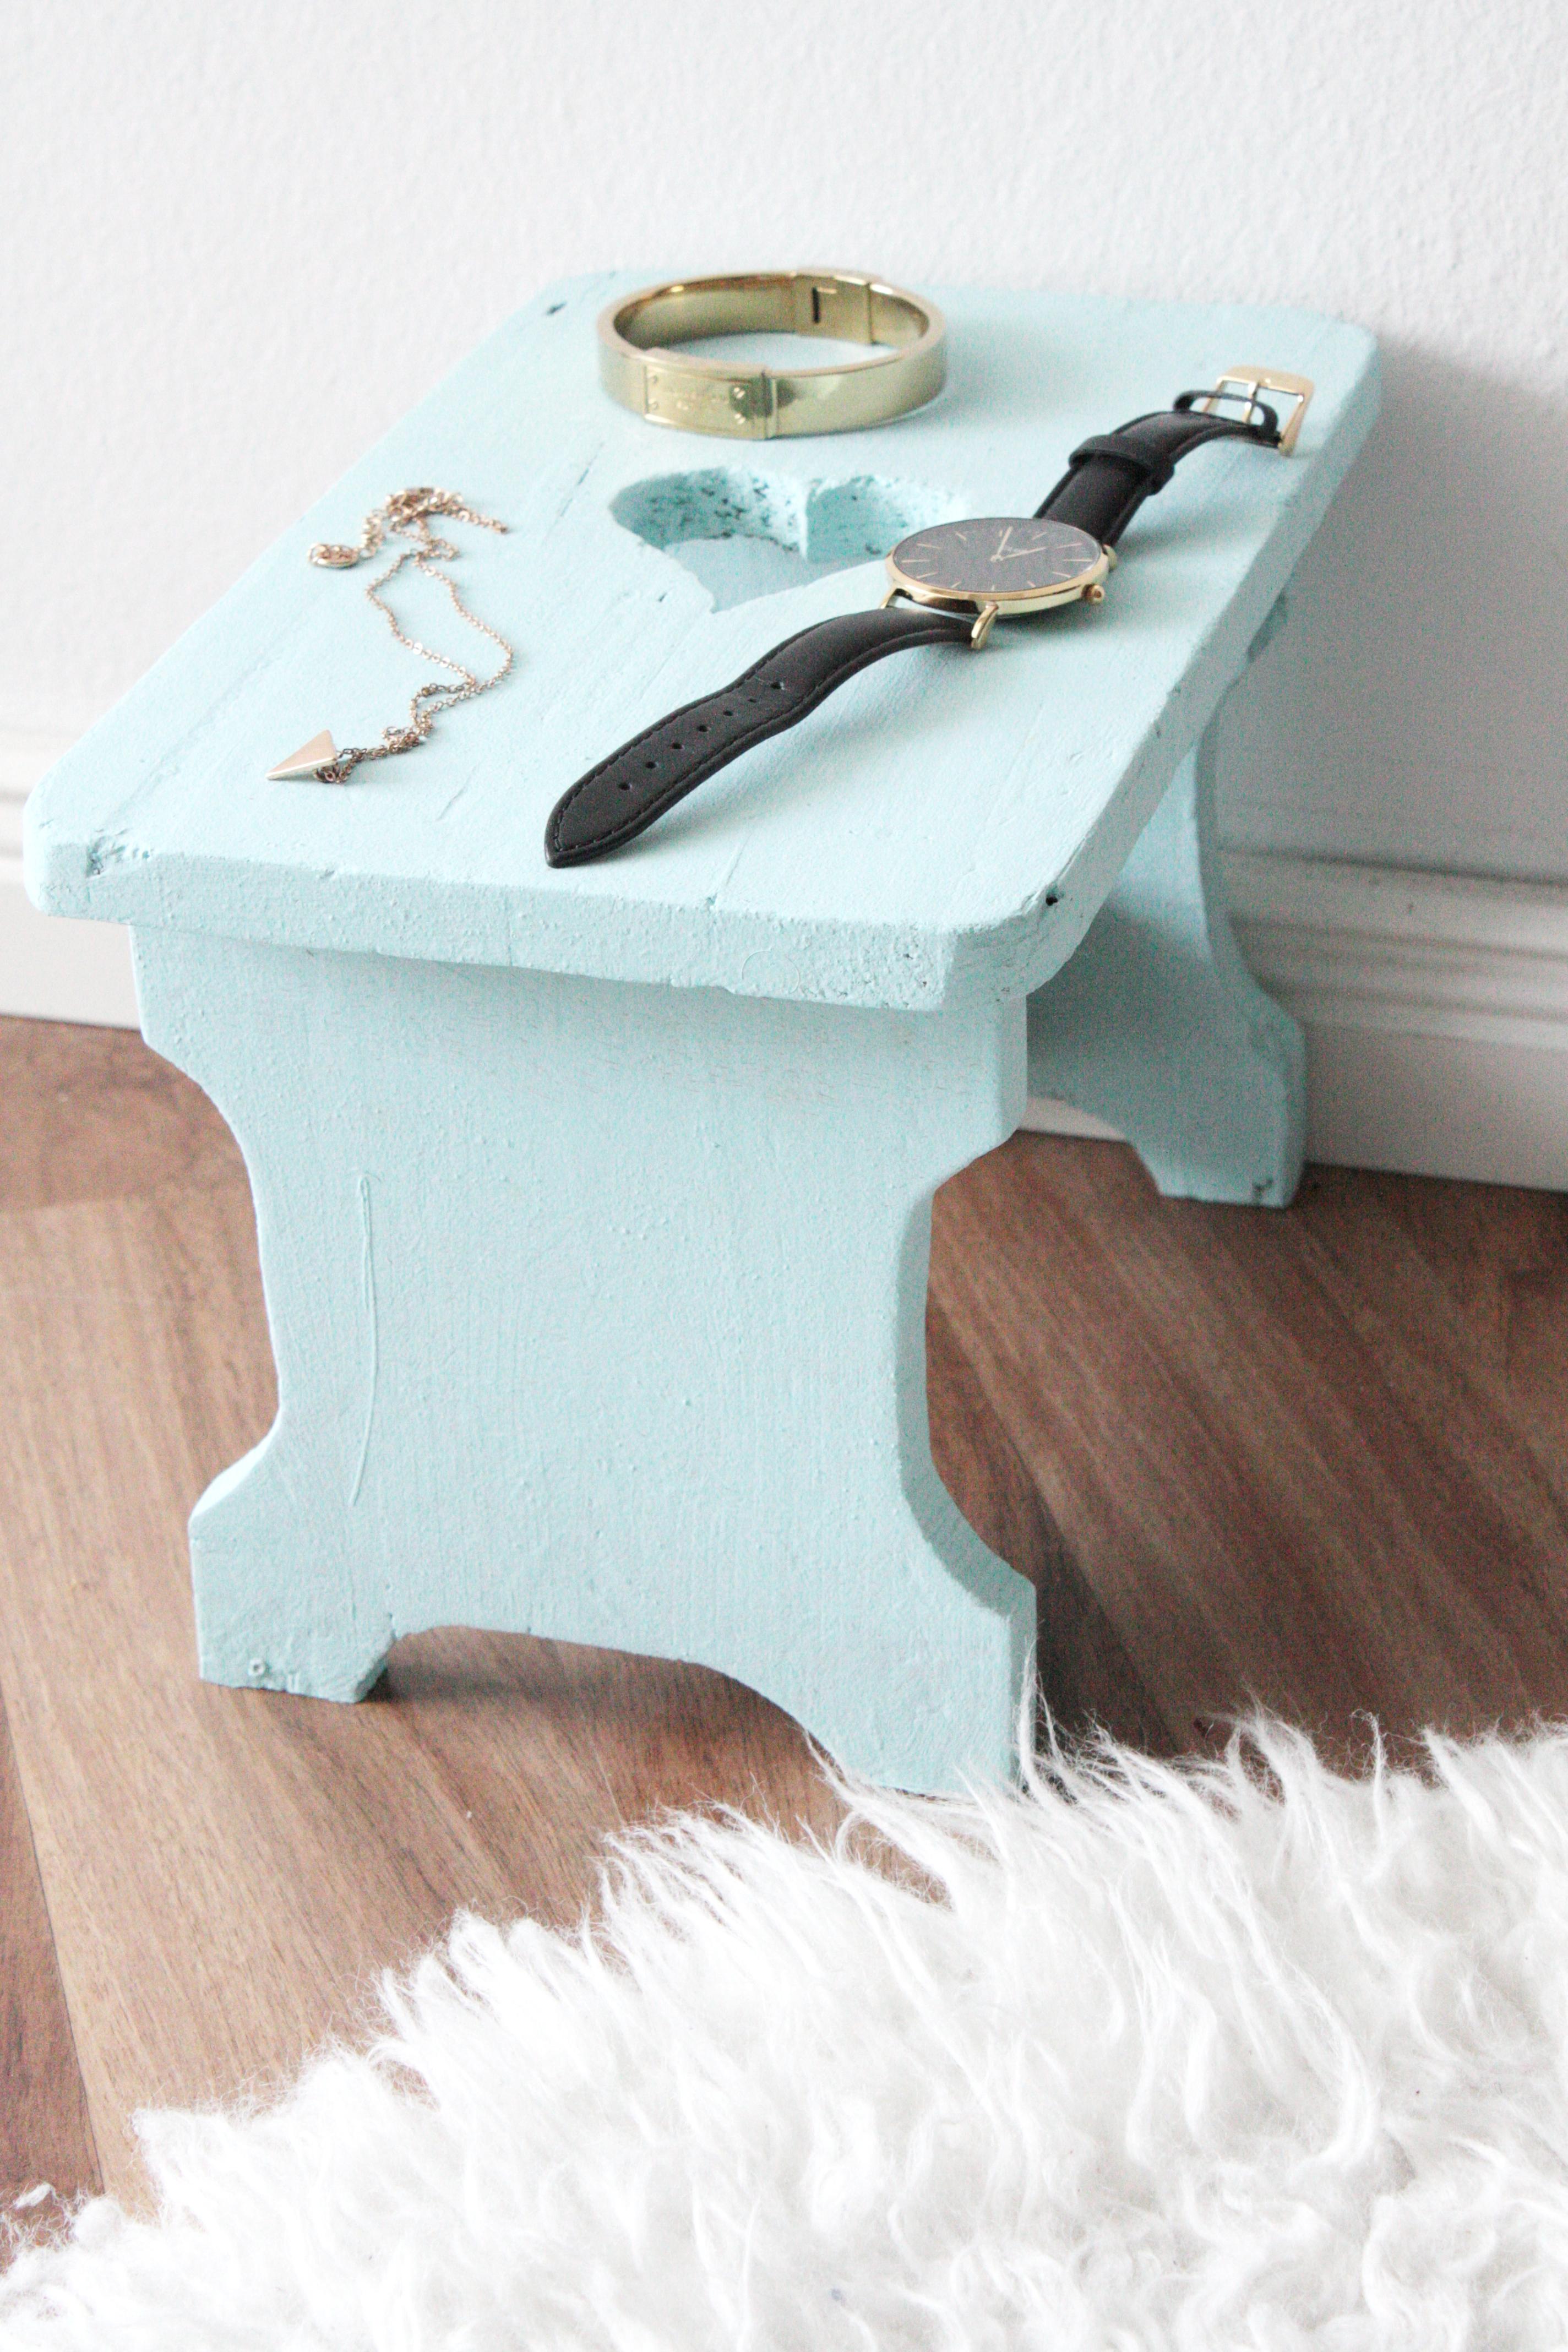 alte m bel aufpeppen mein neuer hocker rosy grey diy blog lettering m nchen. Black Bedroom Furniture Sets. Home Design Ideas